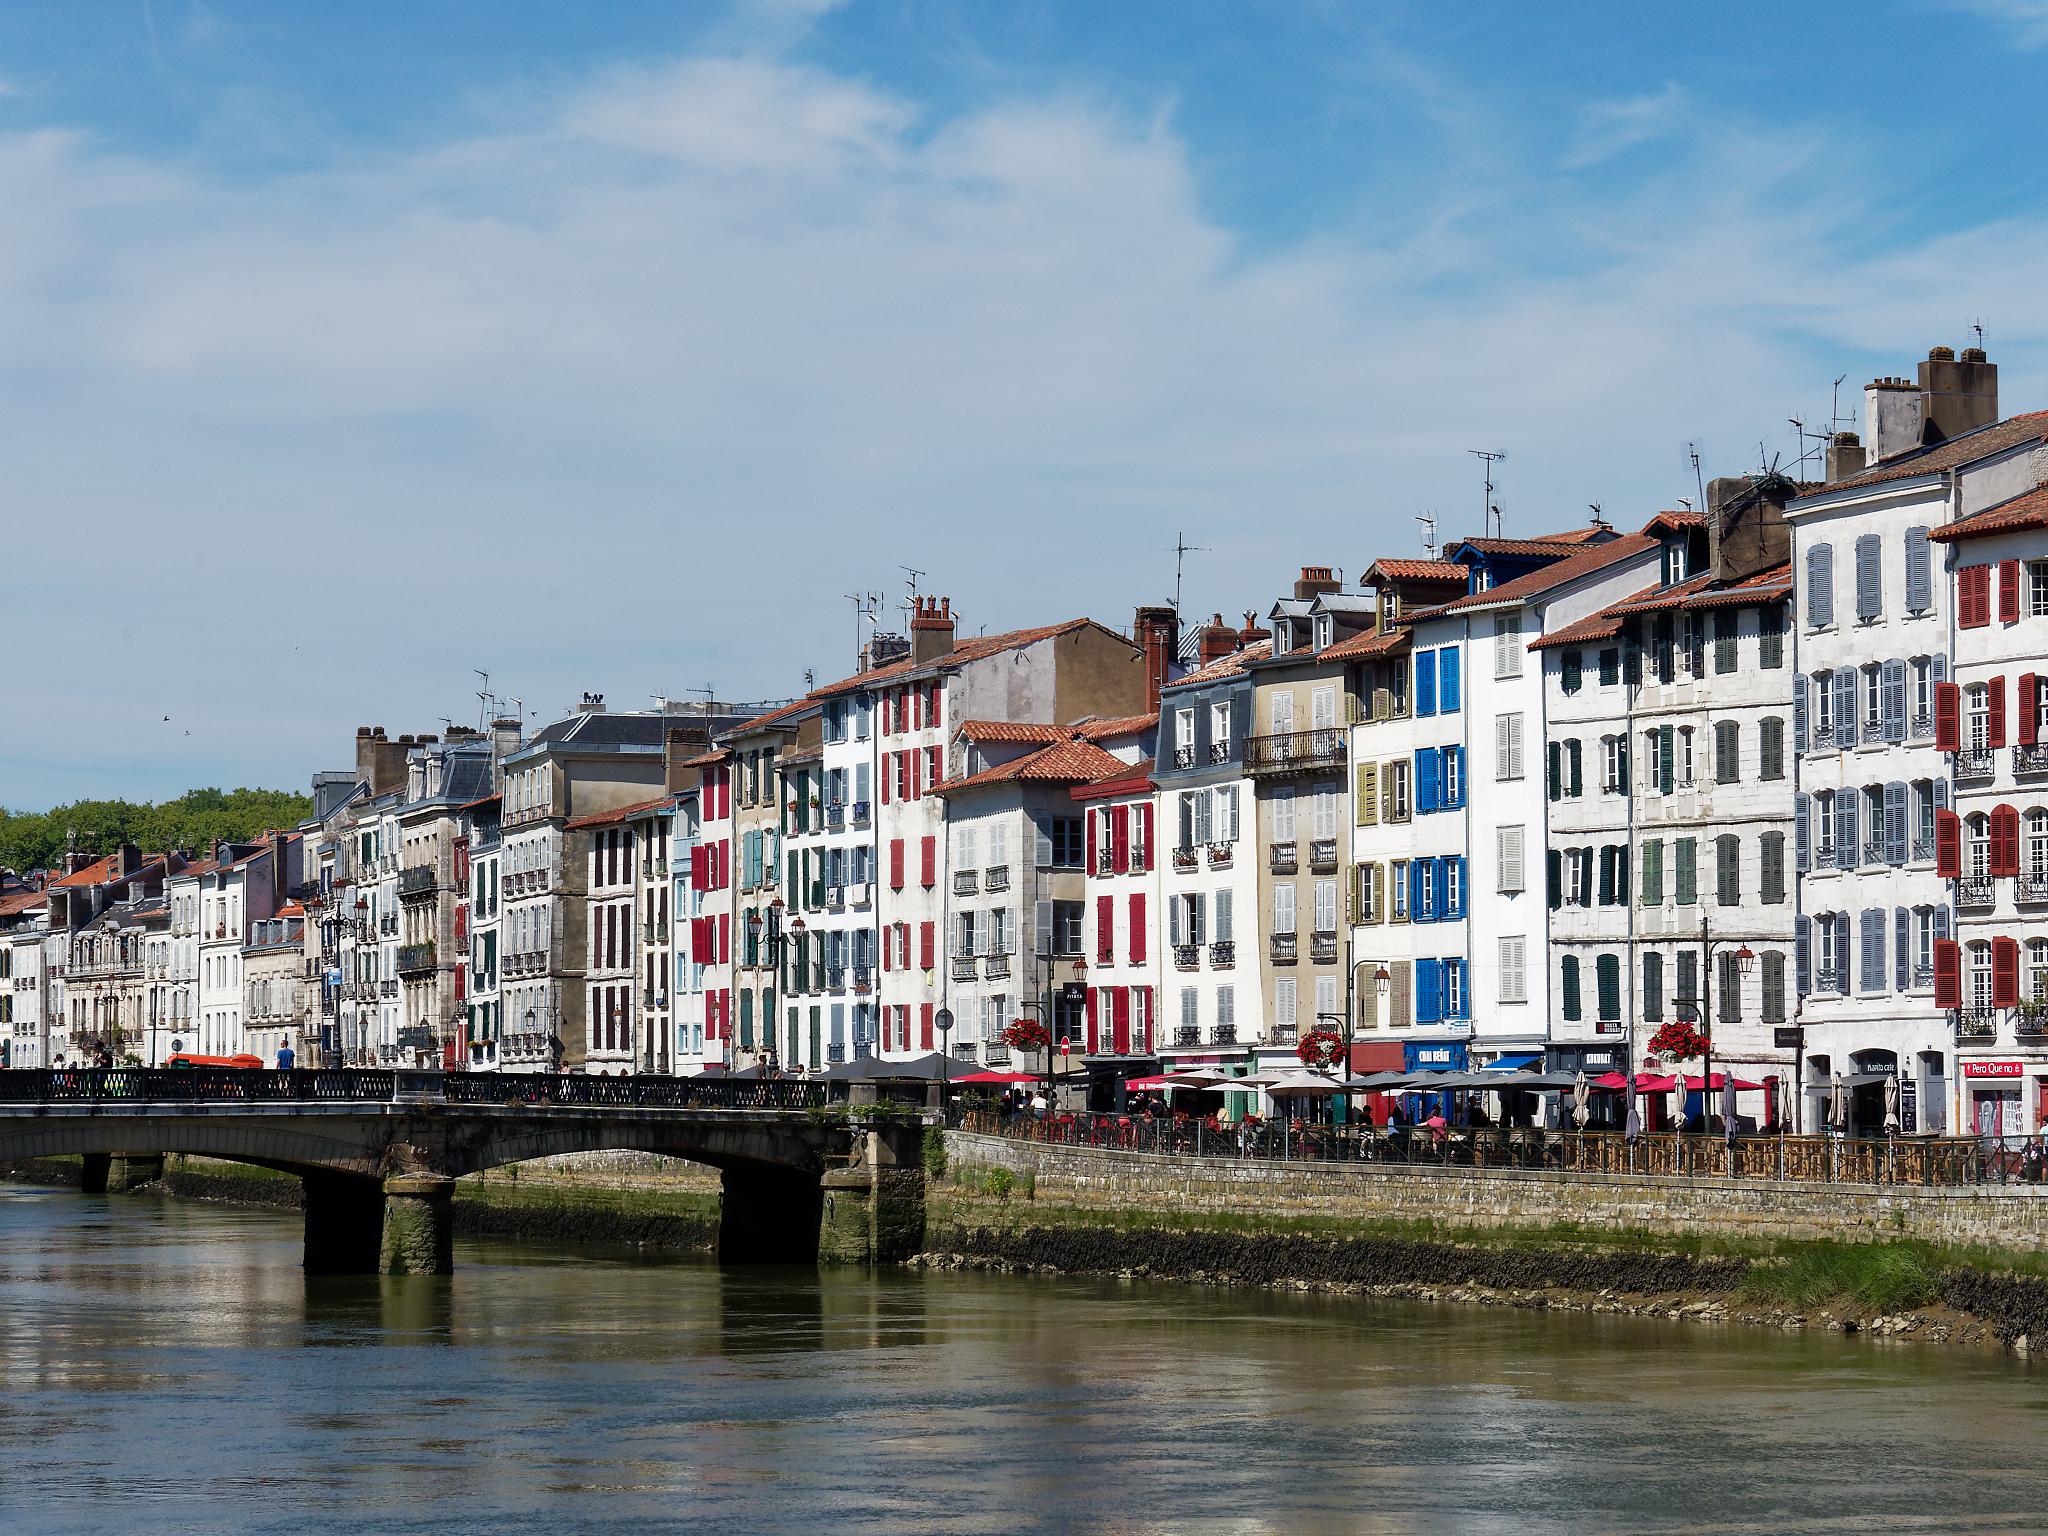 25 Juillet – Pontonx sur Adour / Biarritz